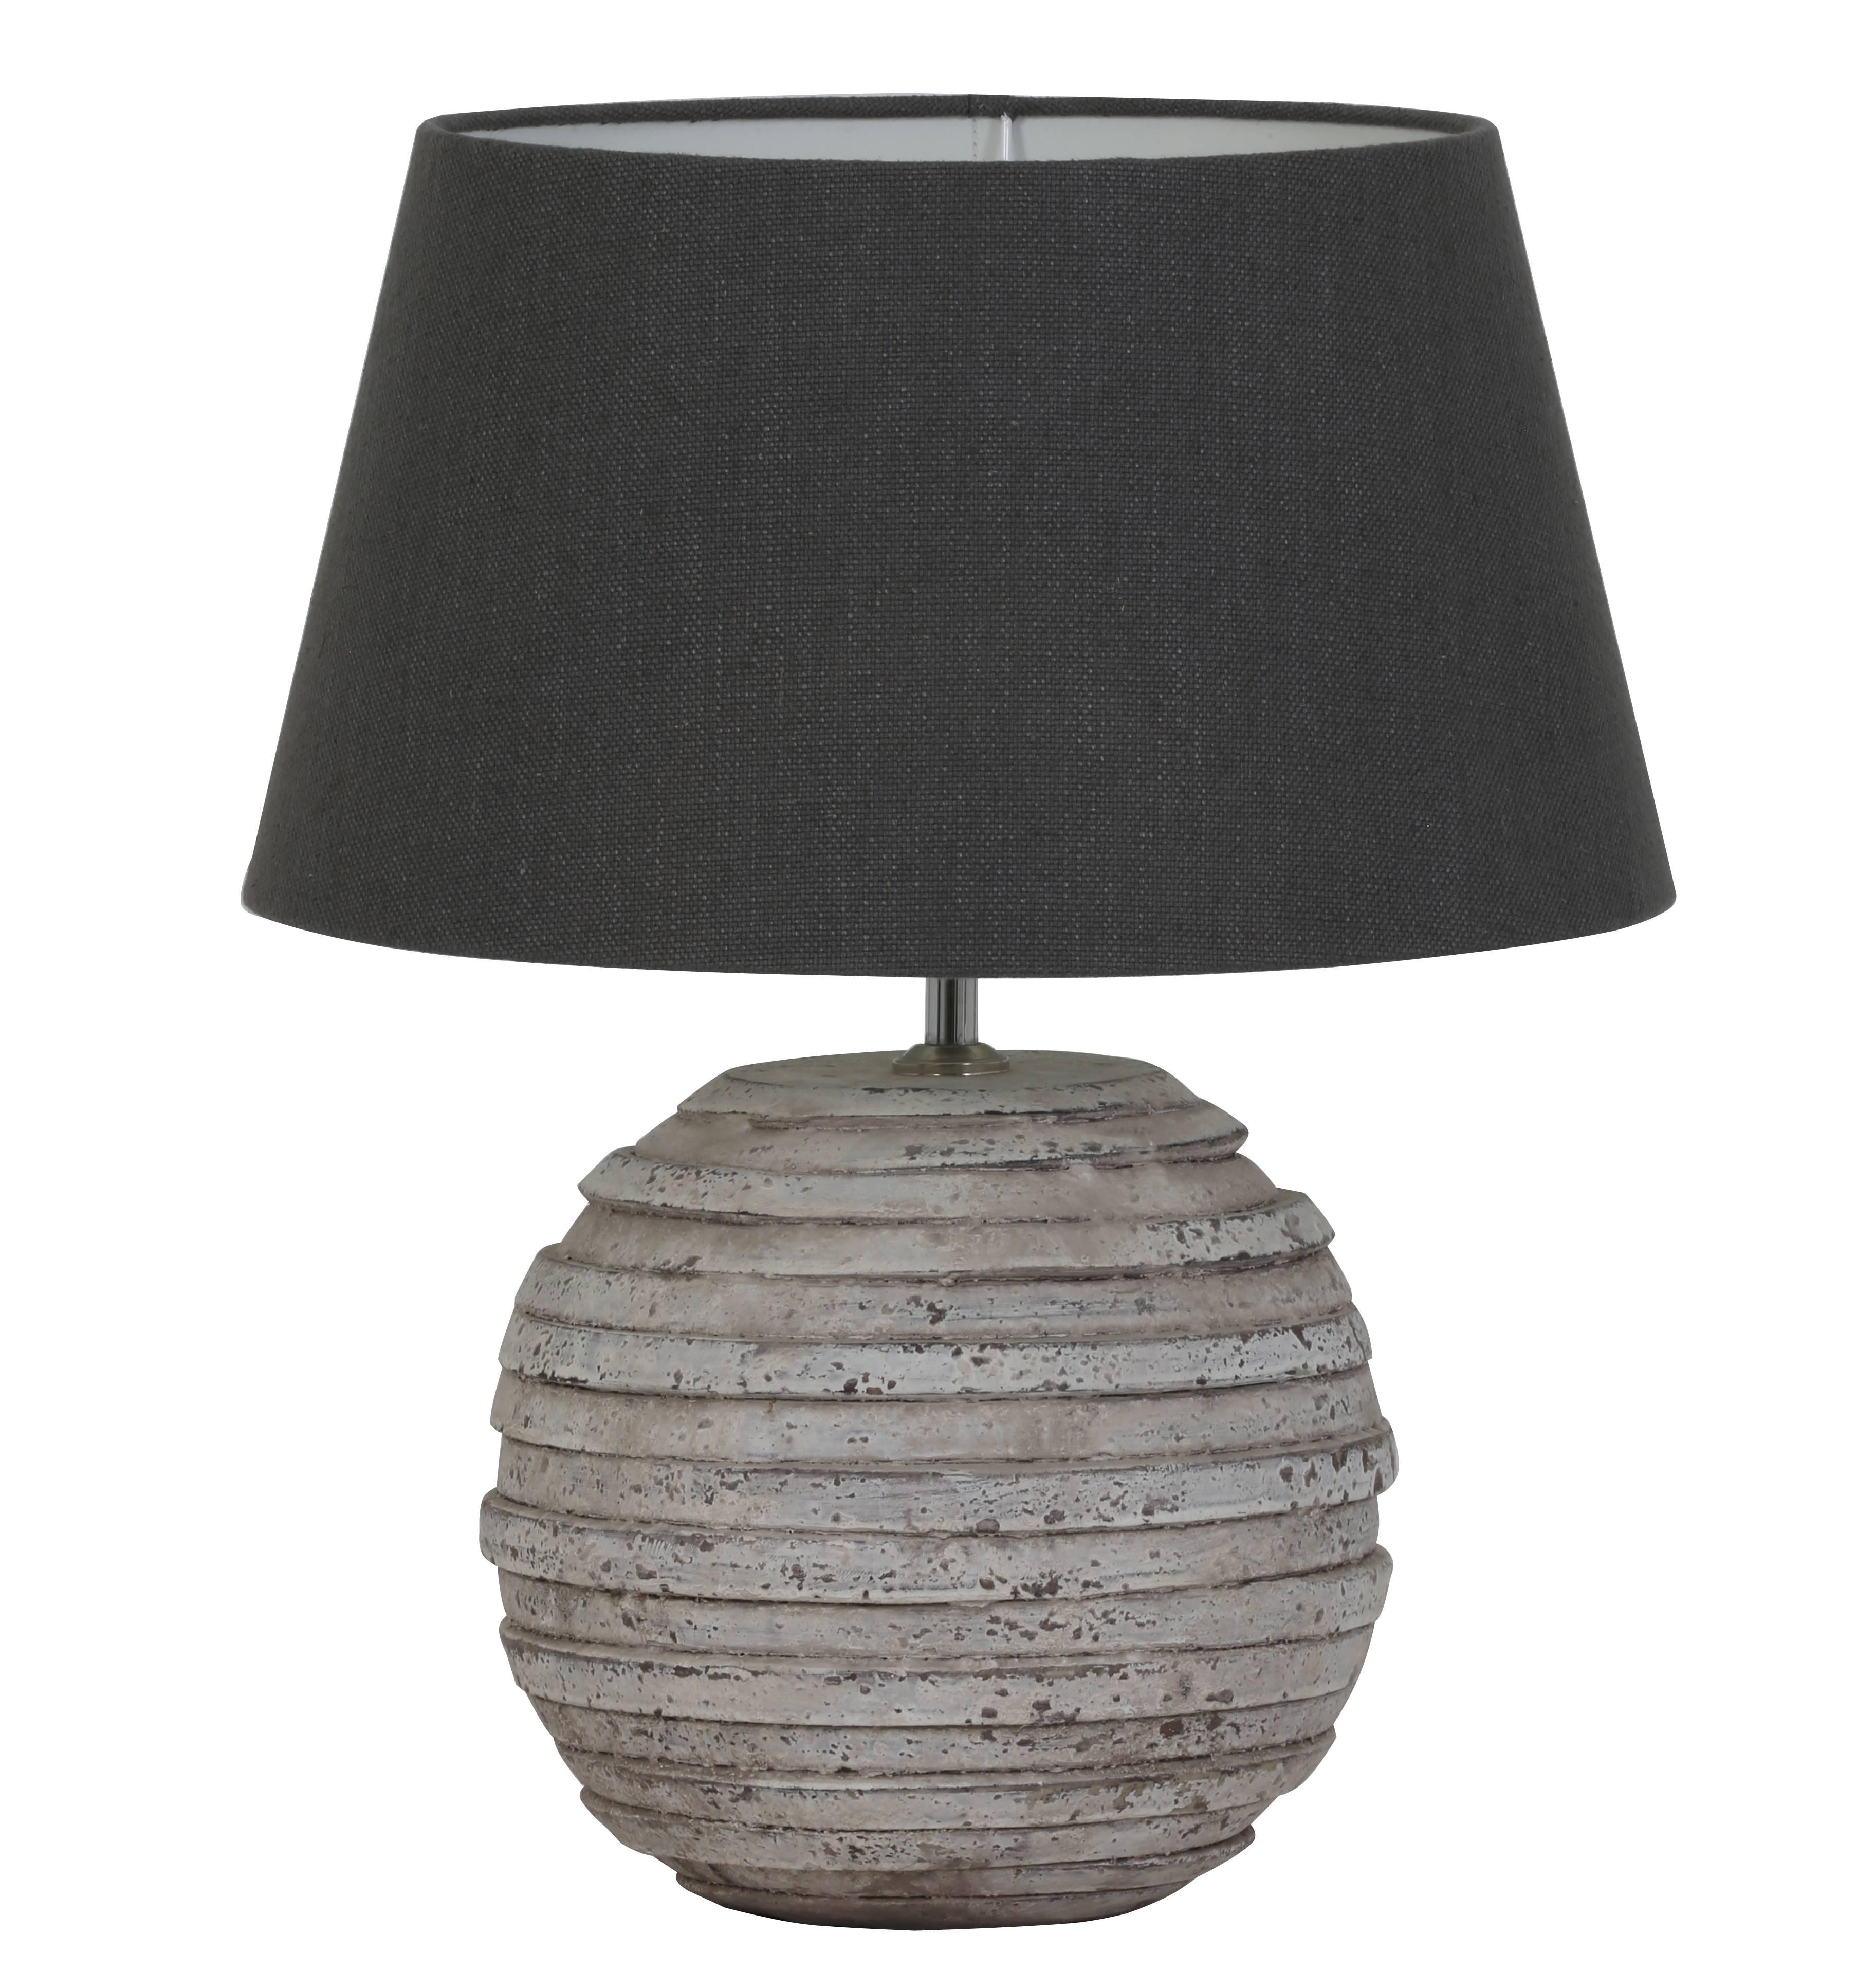 Lampe A Poser Awasa Luminaire D Appoint De Salon Avec Abat Jour En